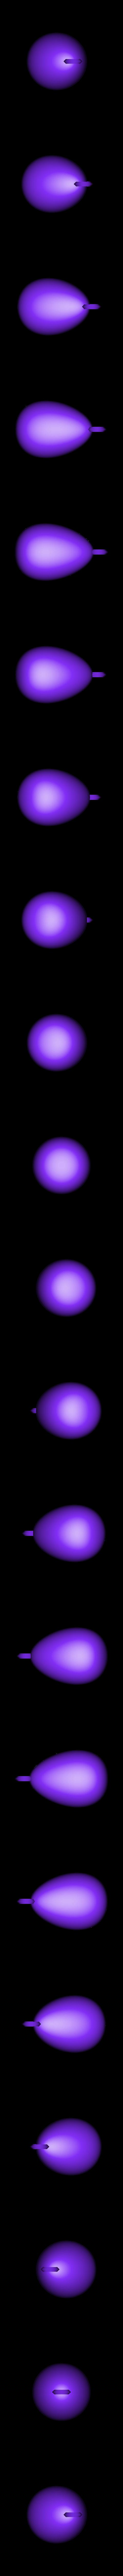 whole_egg_plain.stl Download free STL file Happy Easter Eggs • 3D print model, tone001